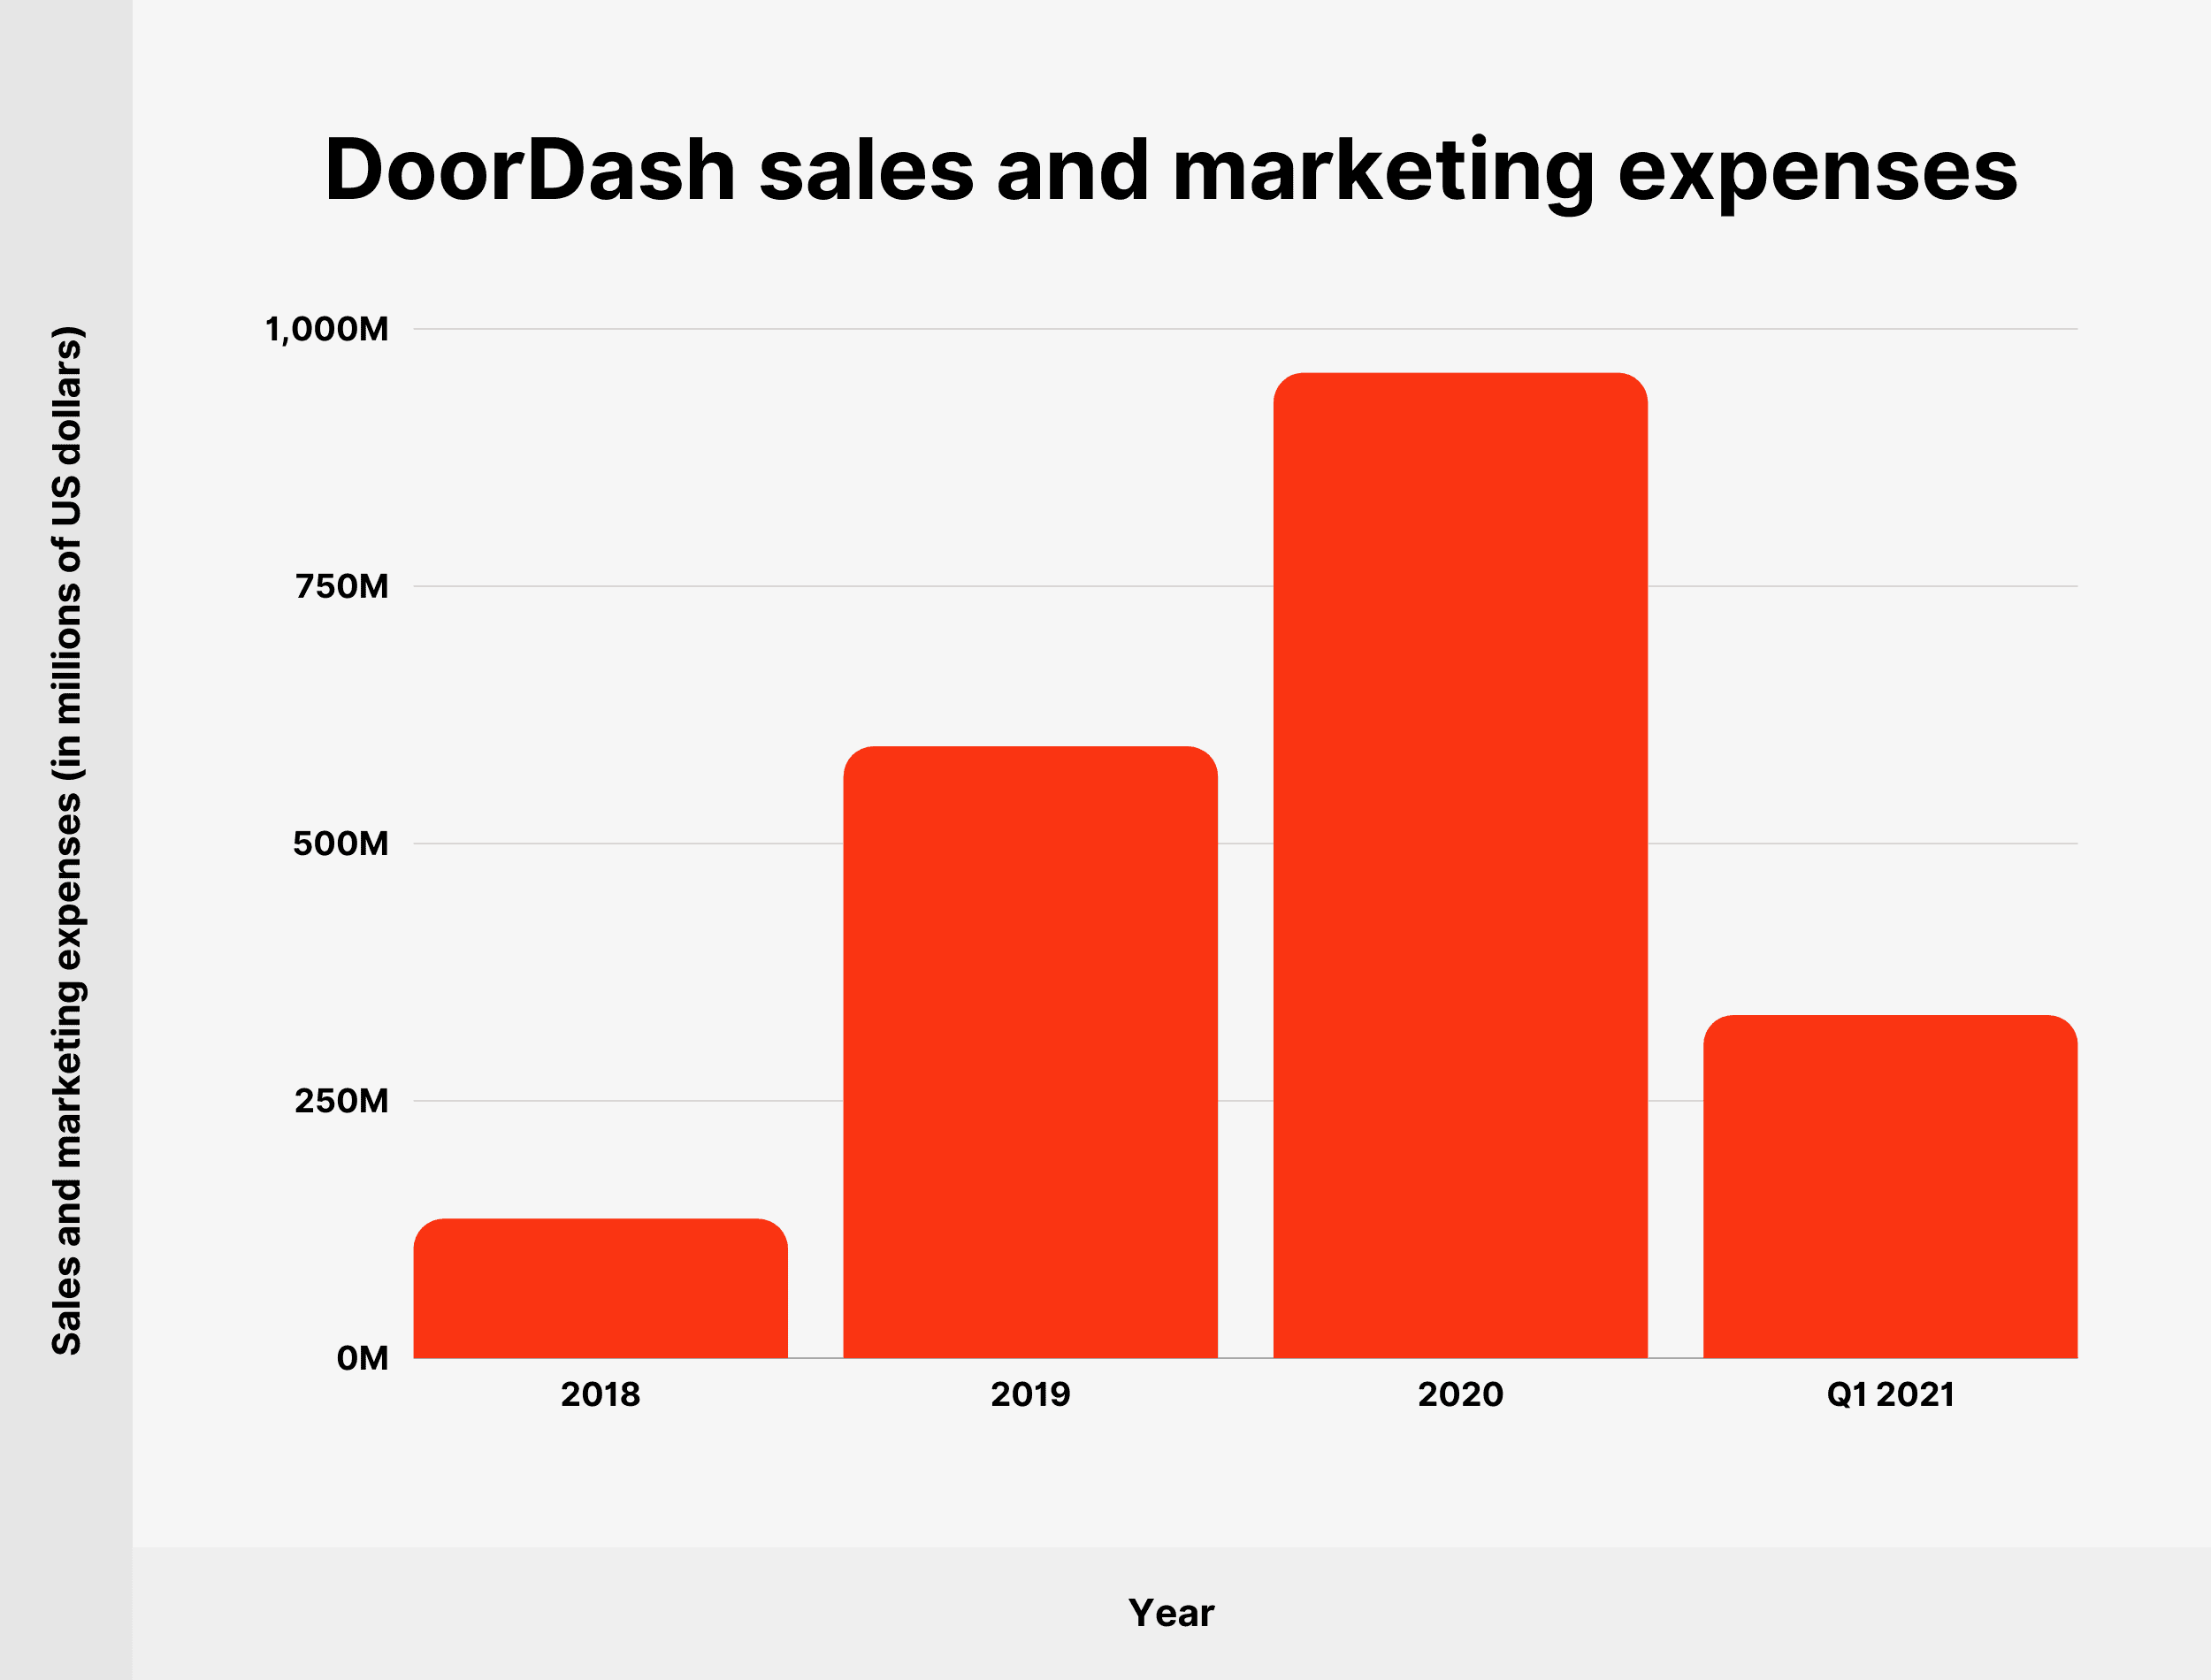 DoorDash sales and marketing expenses